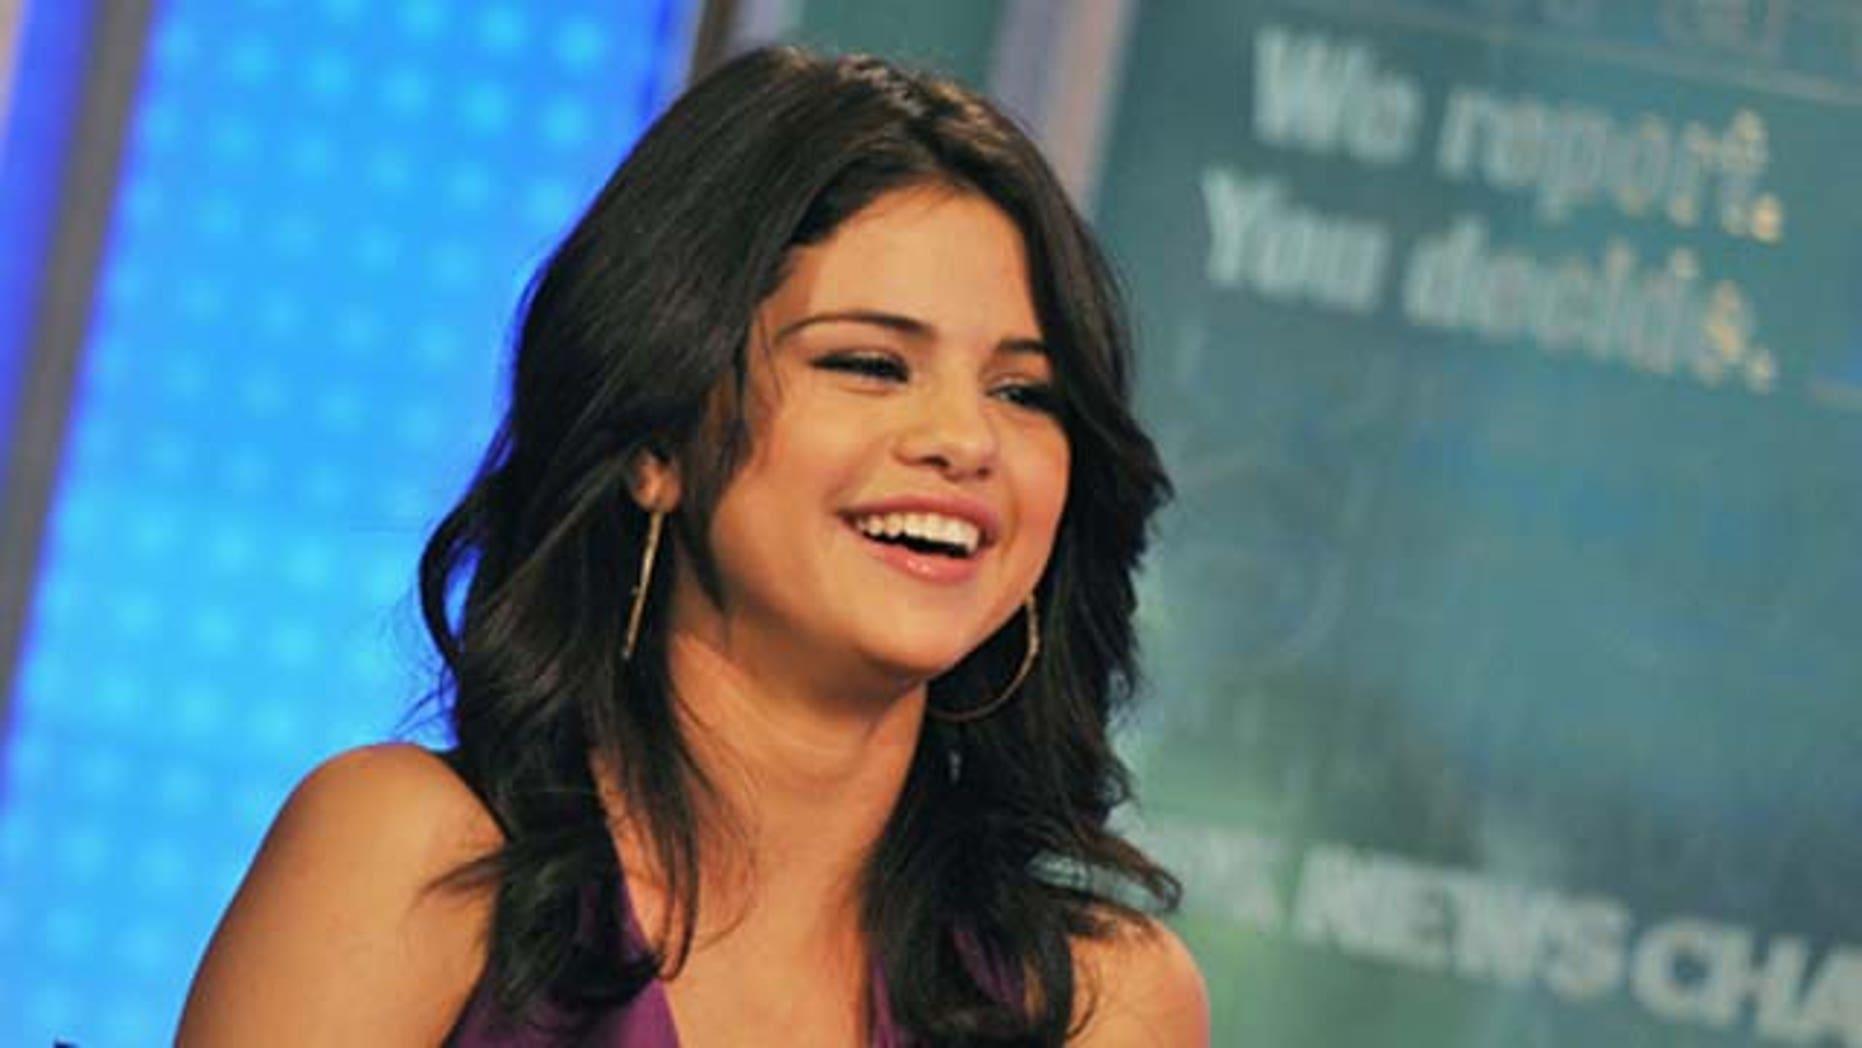 June 29, 2011: Singer/actress Selena Gomez visits 'FOX & Friends' at FOX Studios in New York City.